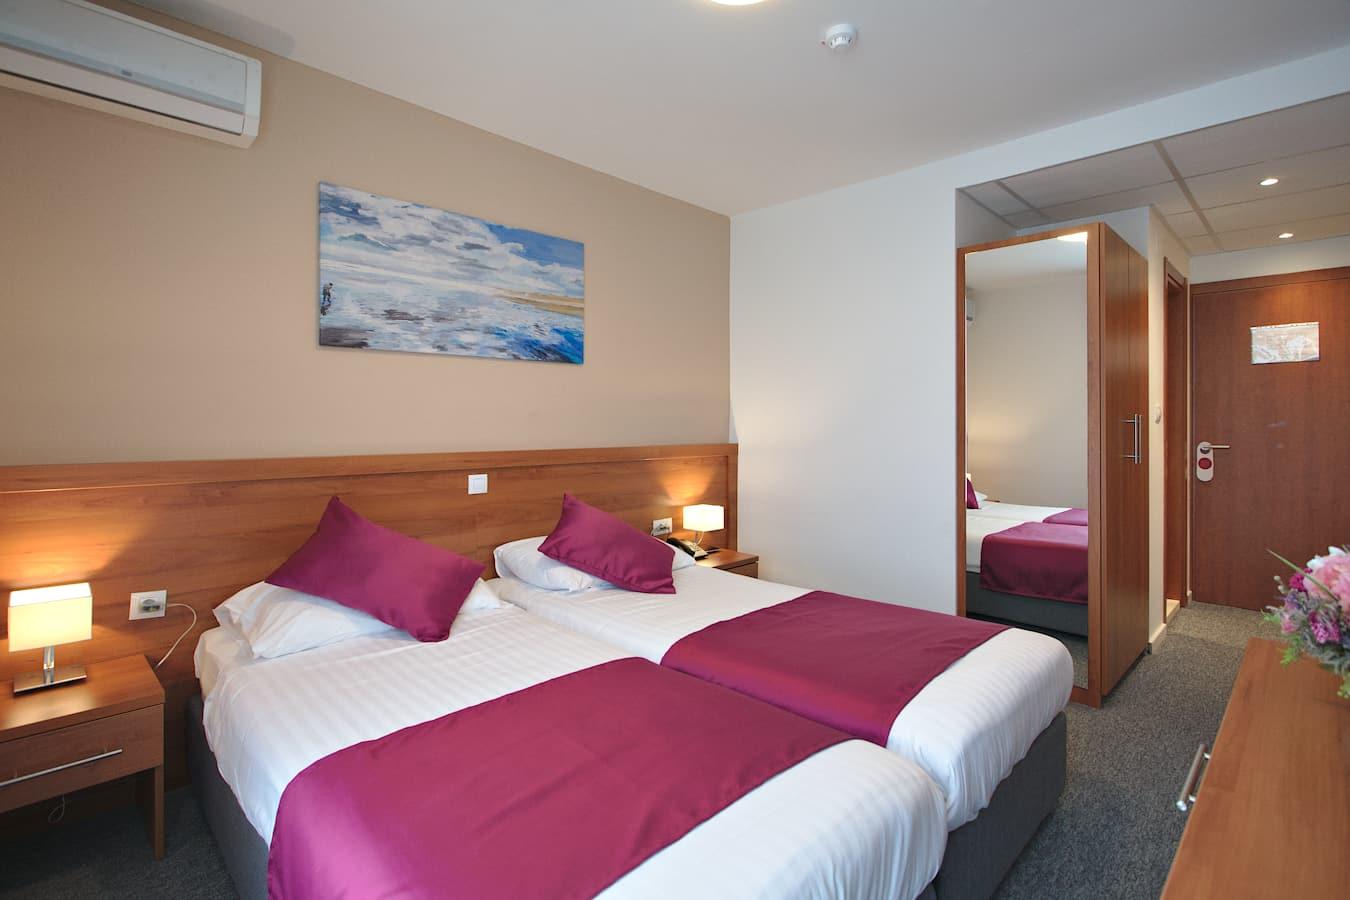 annex-komodor-hotel-dubrovnik-double-room.jpg